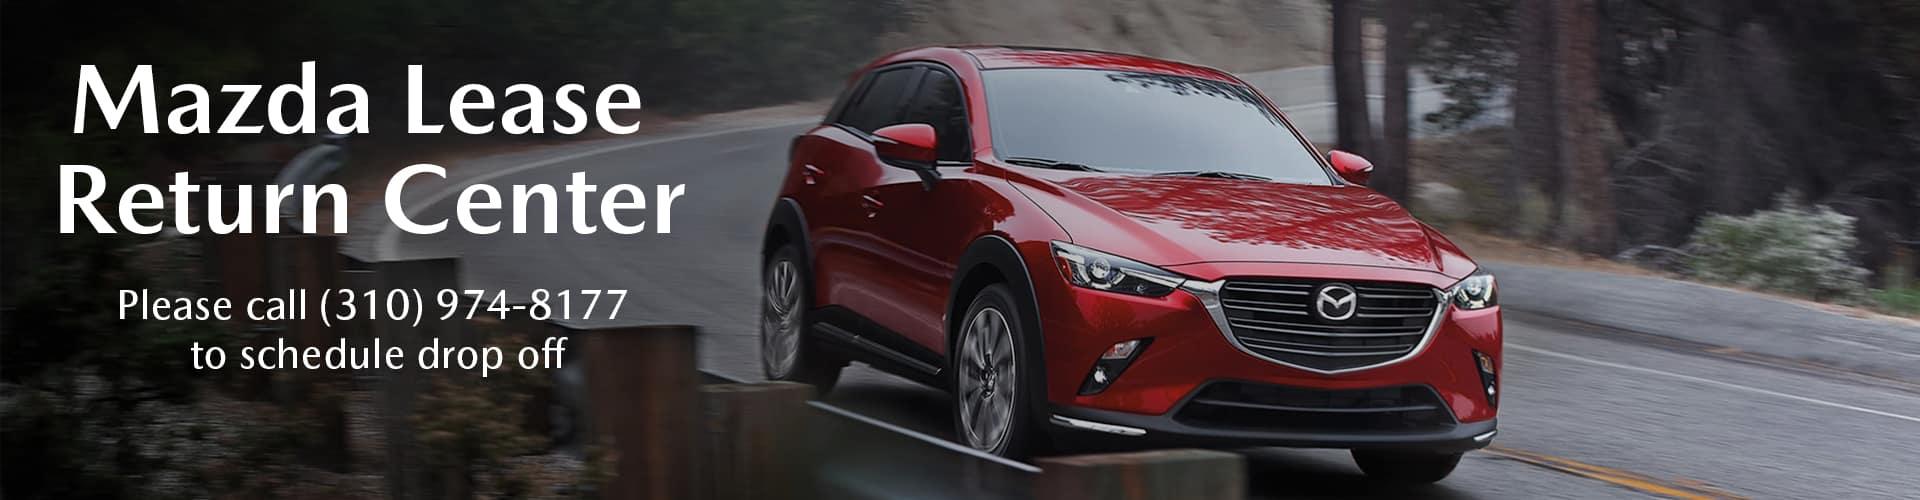 Mazda Lease Return Center